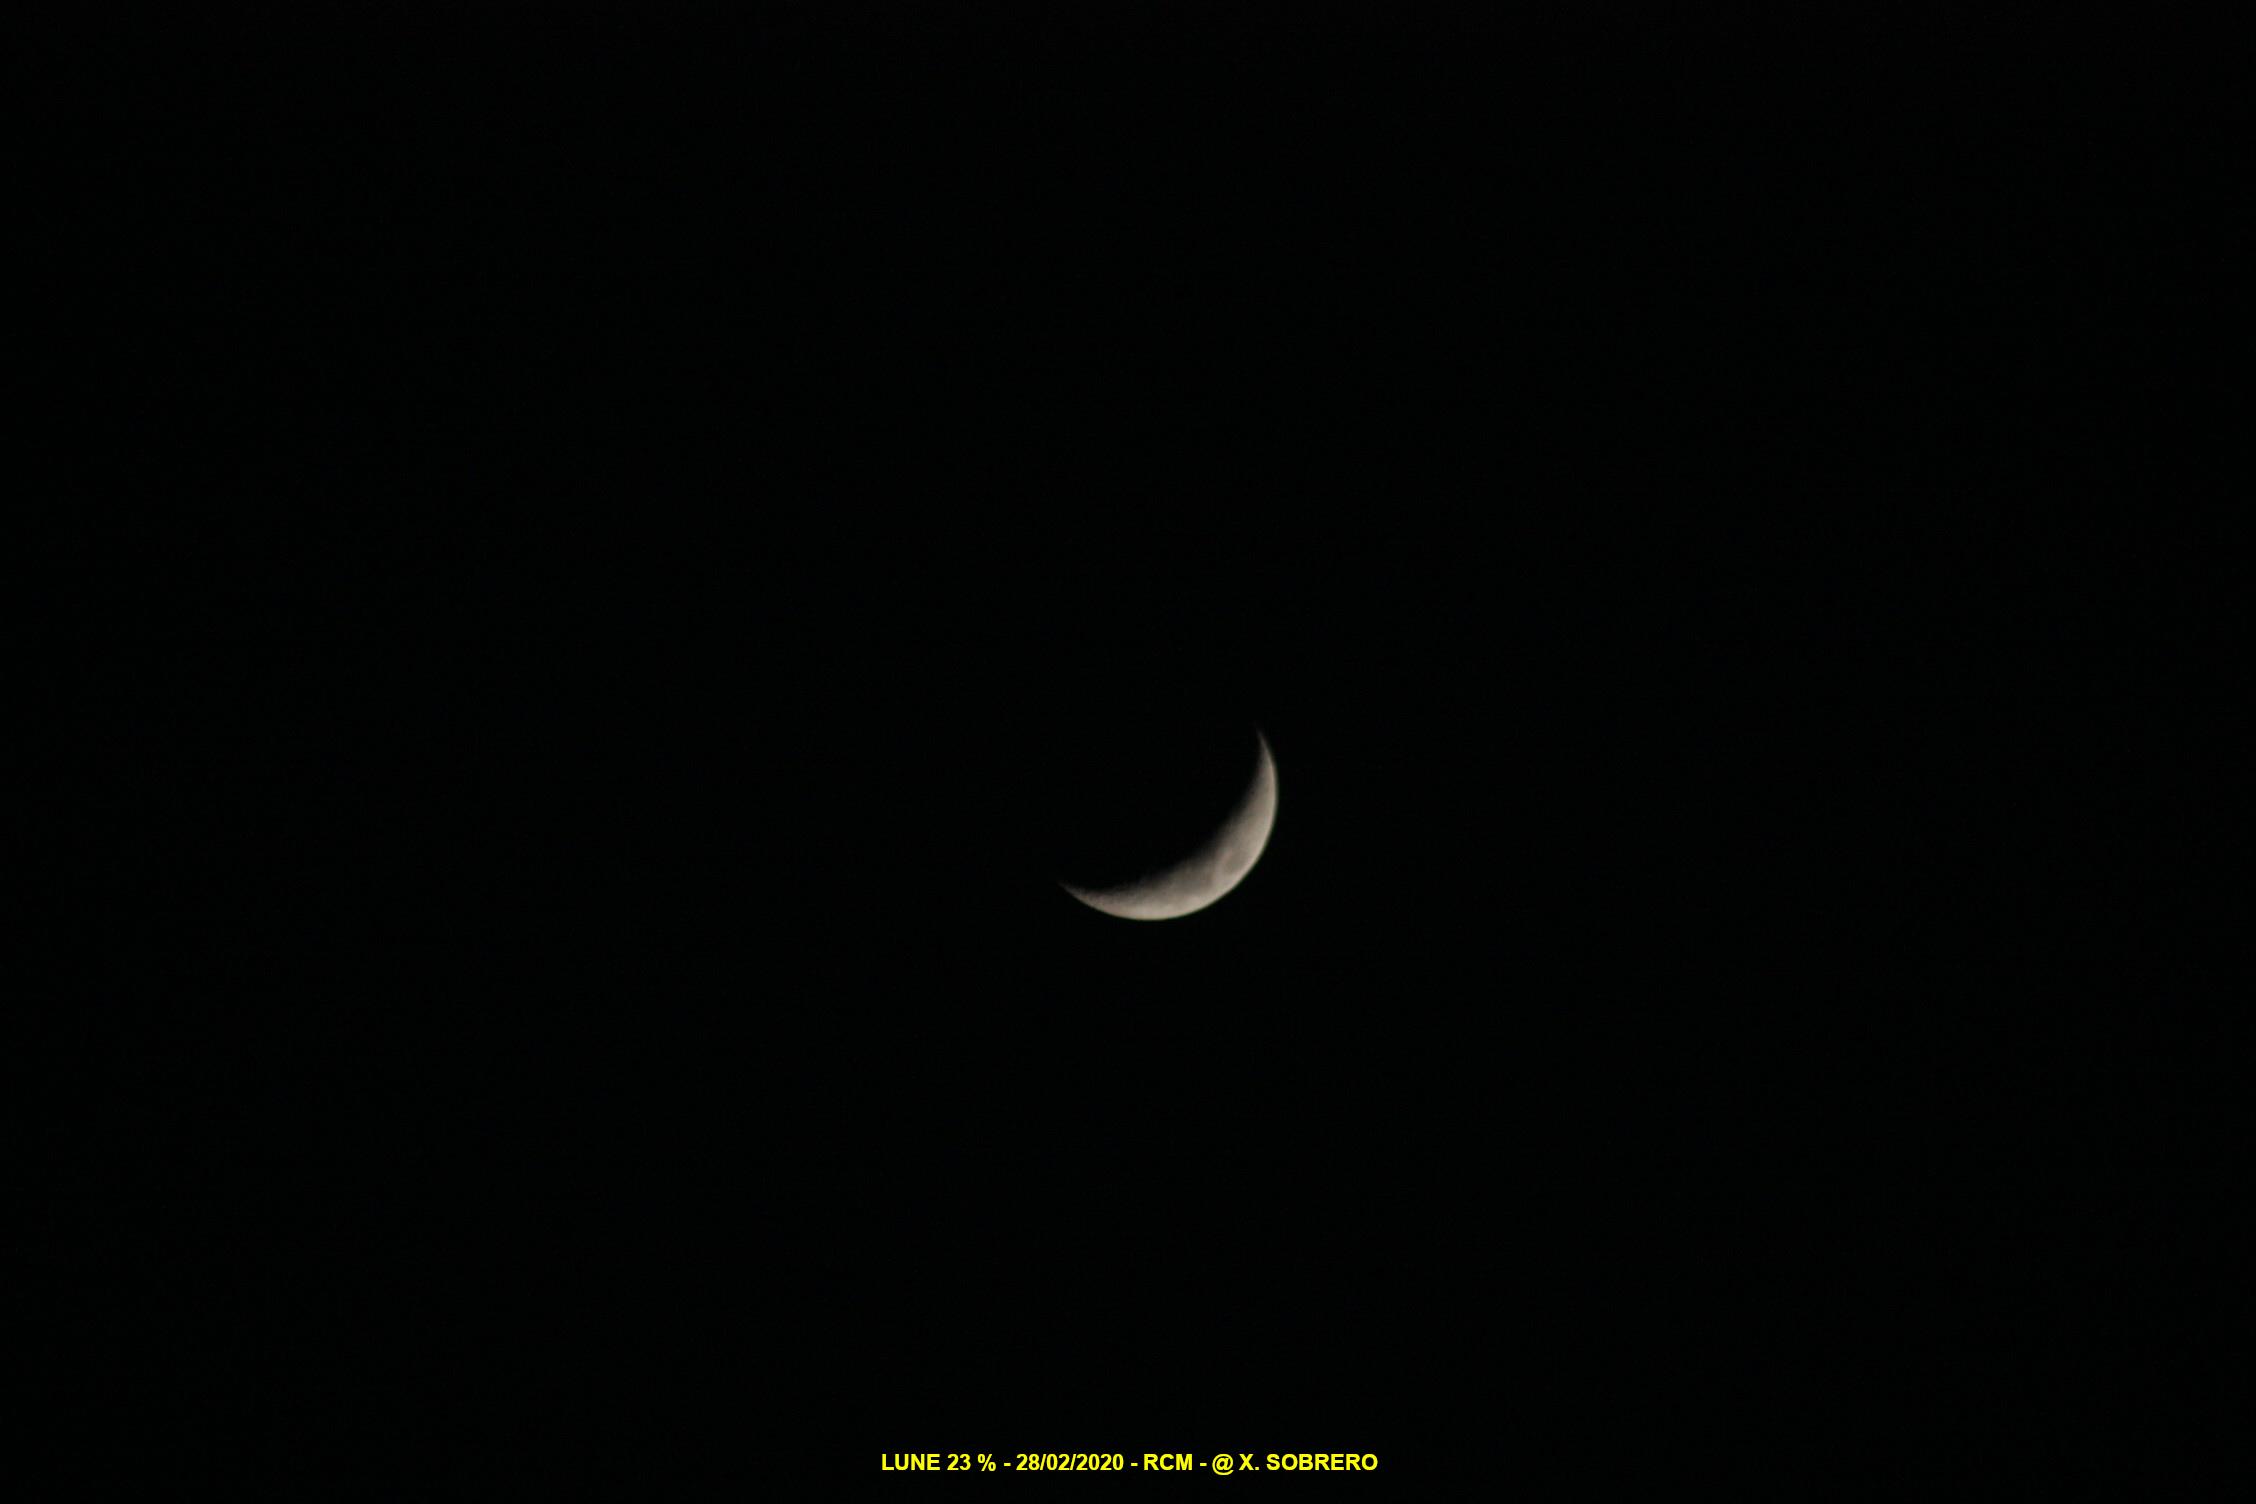 large.LUNE_20200228.jpg.a3e83b5b8afd47fc1bb6c6ac0fb9c3b5.jpg